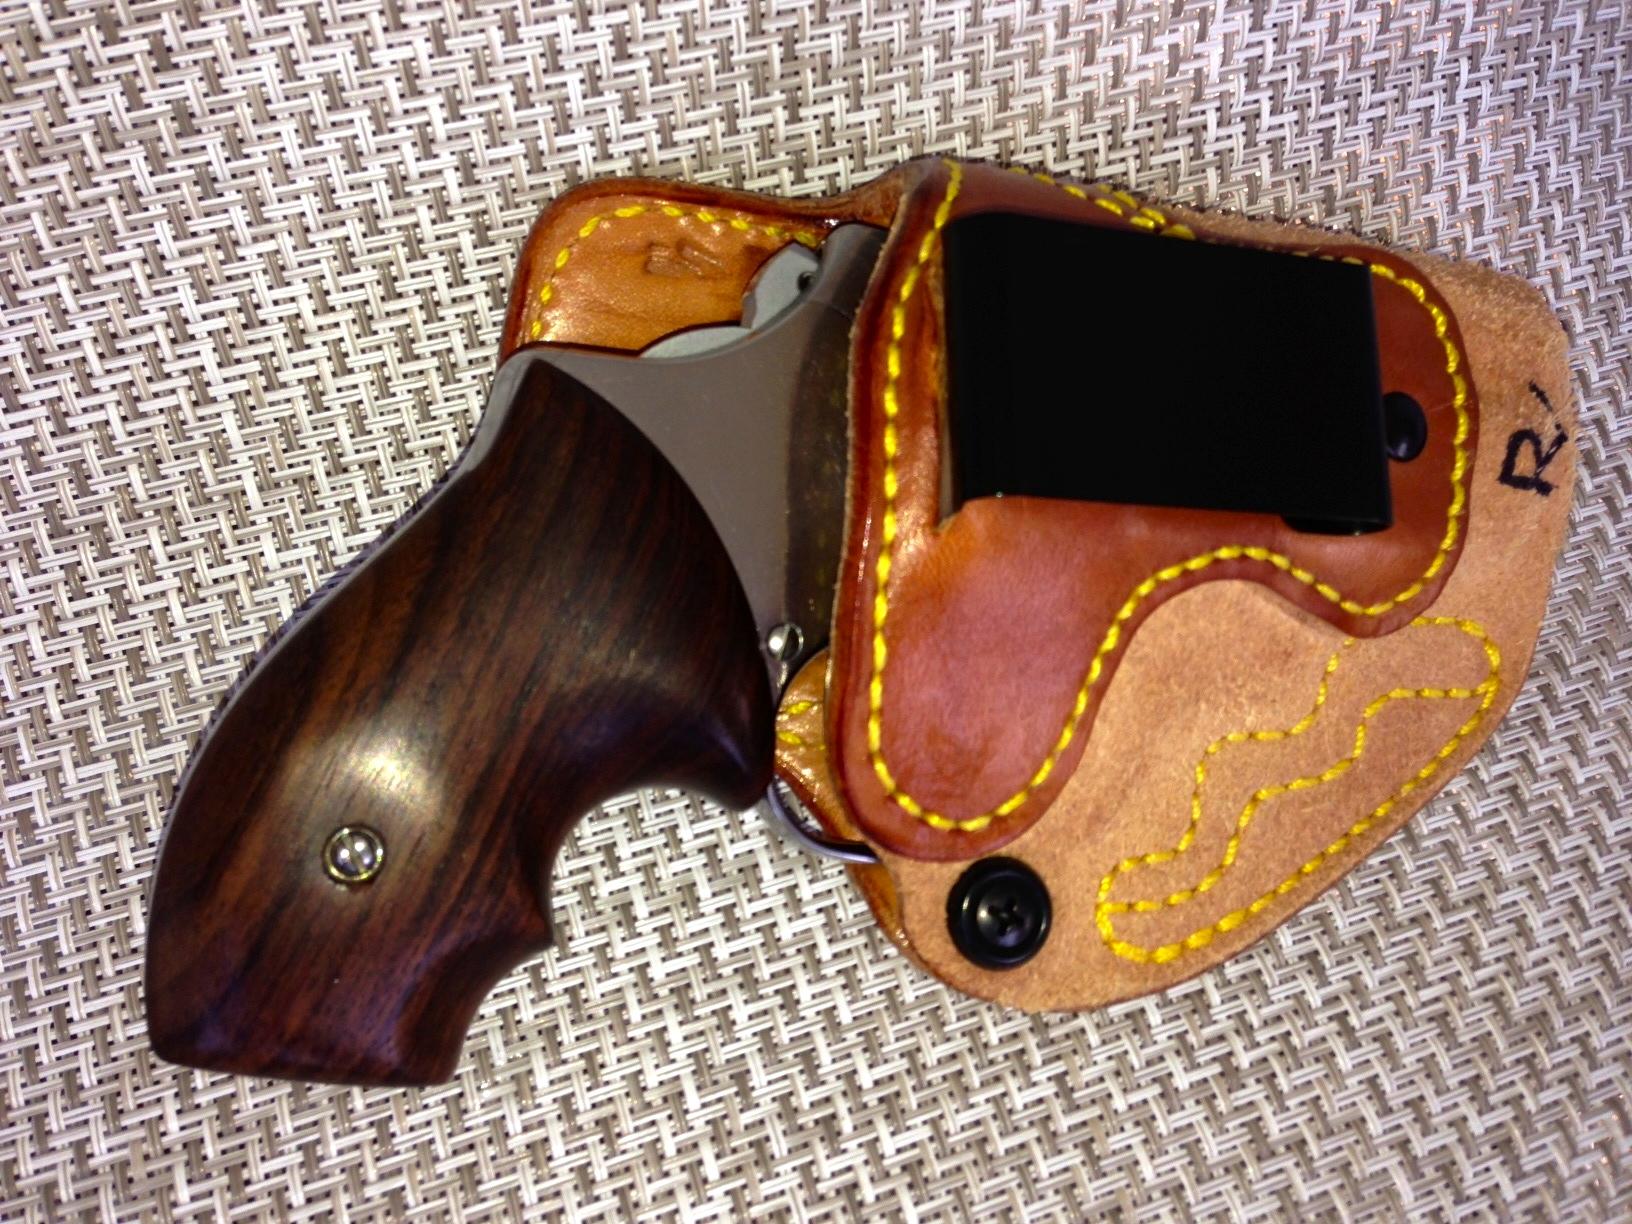 IWB or Pocket carry